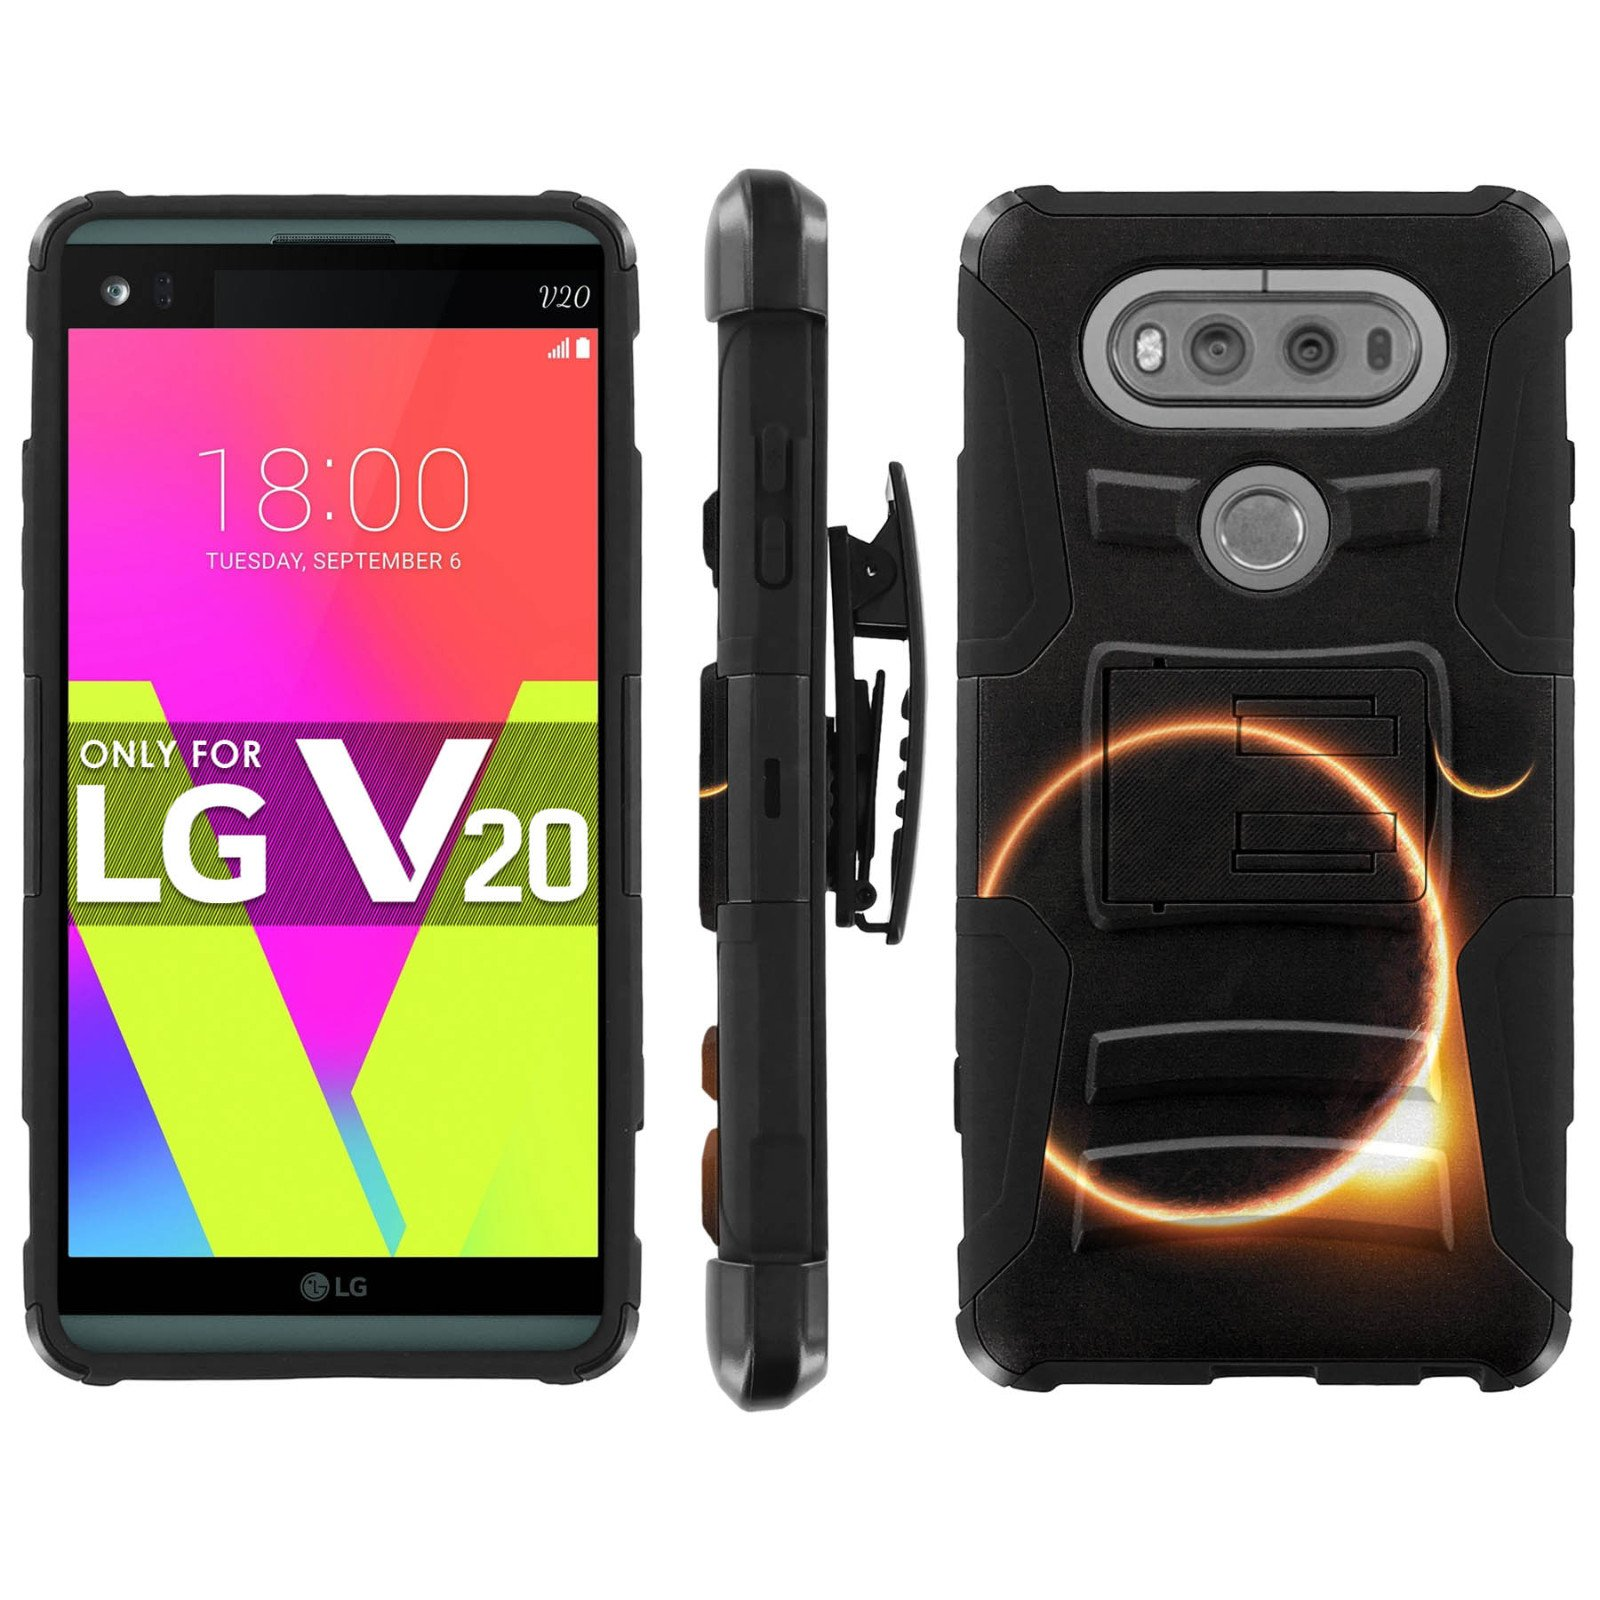 LG V20 Phone Cover, Solar Eclipse- Black Blitz Hybrid Armor Phone Case for [LG V20] with [Kickstand and Holster]